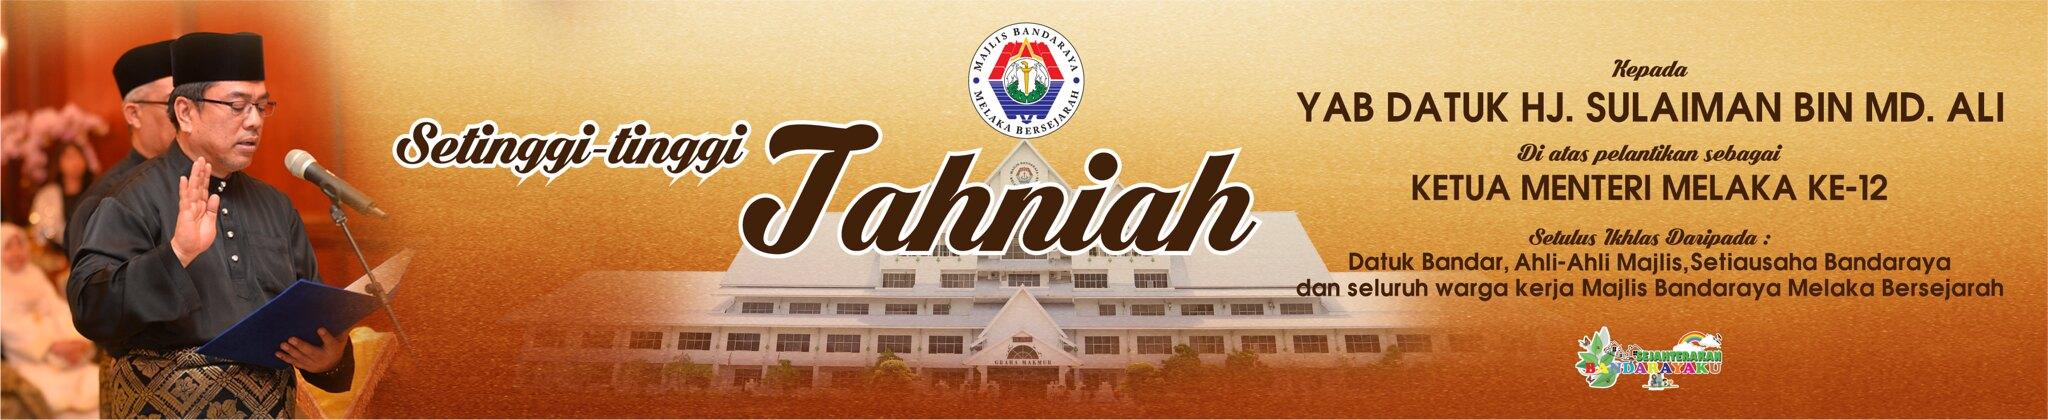 web_UCAPAN TAHNIAH CM12Artboard 50